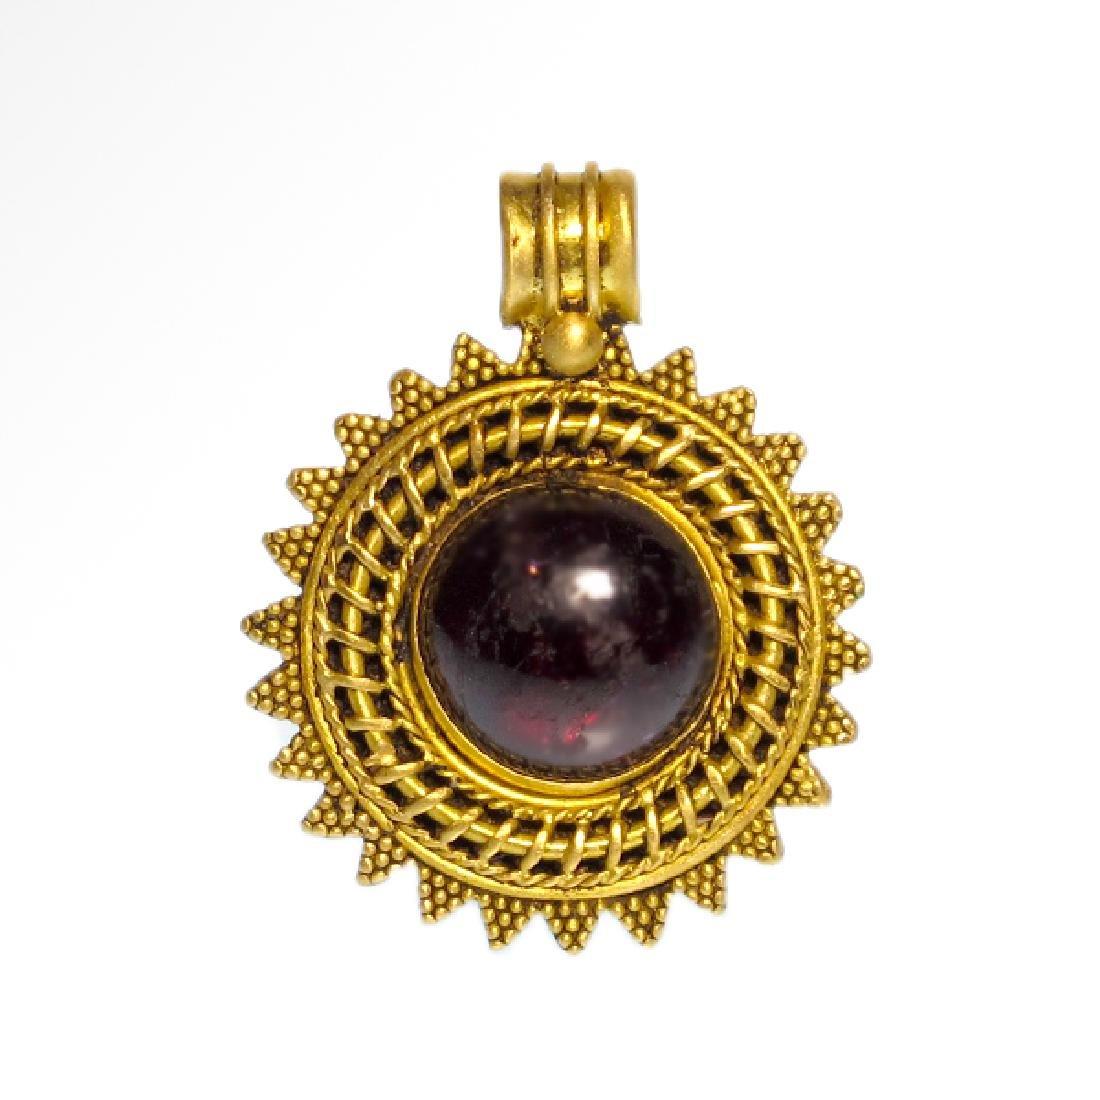 Greek Gold and Garnet Pendant, c. 2nd Century B.C.